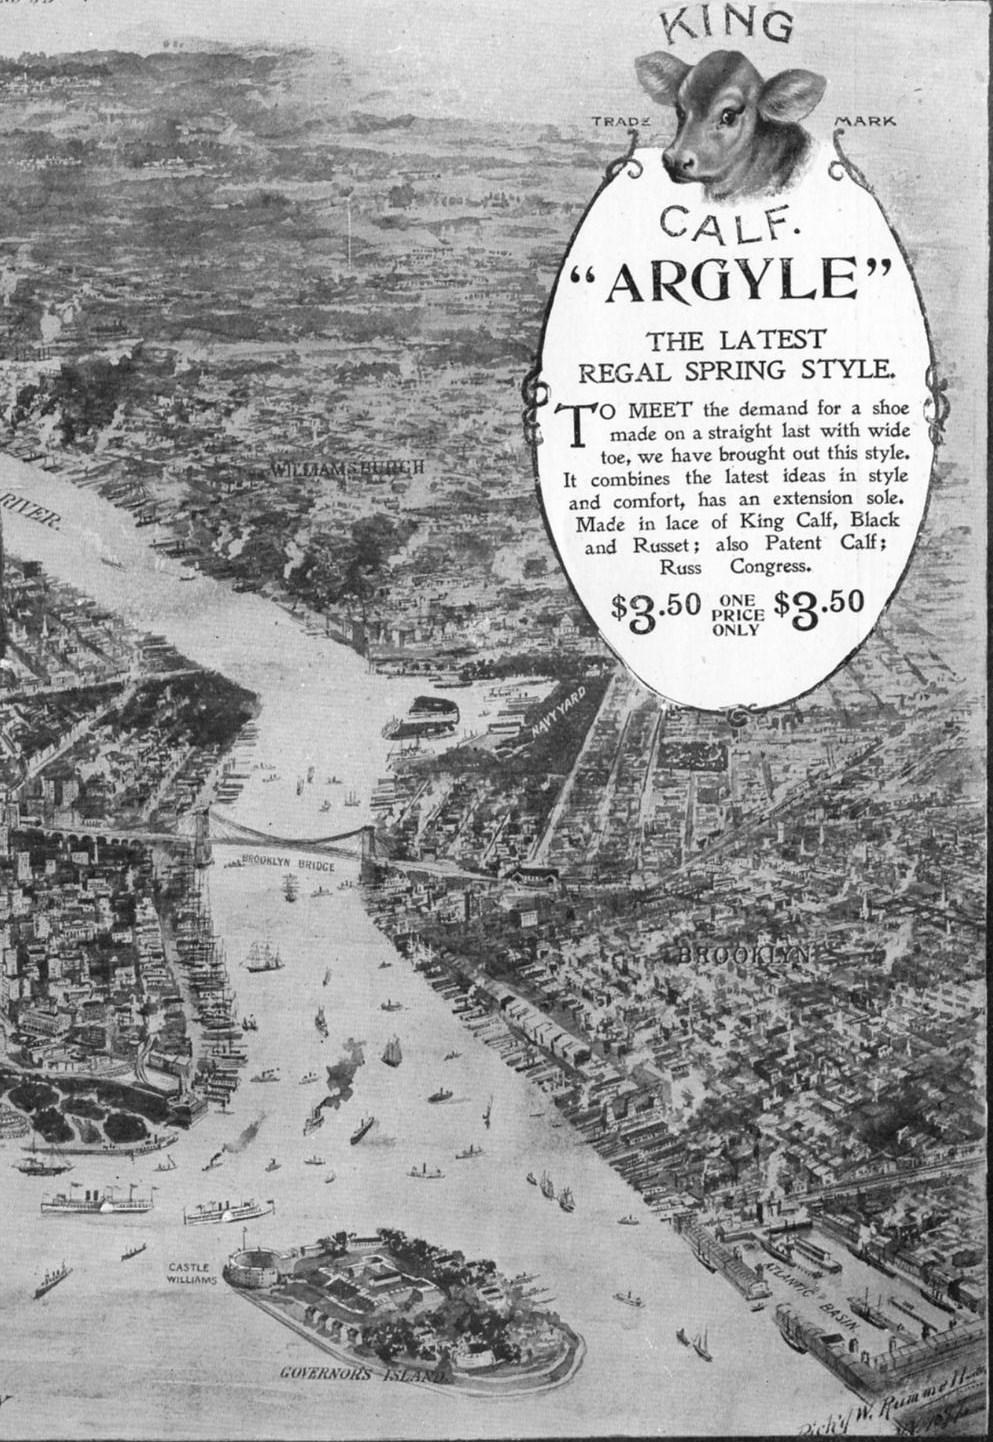 REGAL SHOE KING CALF ARGYLE NEW YORK BAY BROOKLYN BRIDGE STATUE OF LIBERTY